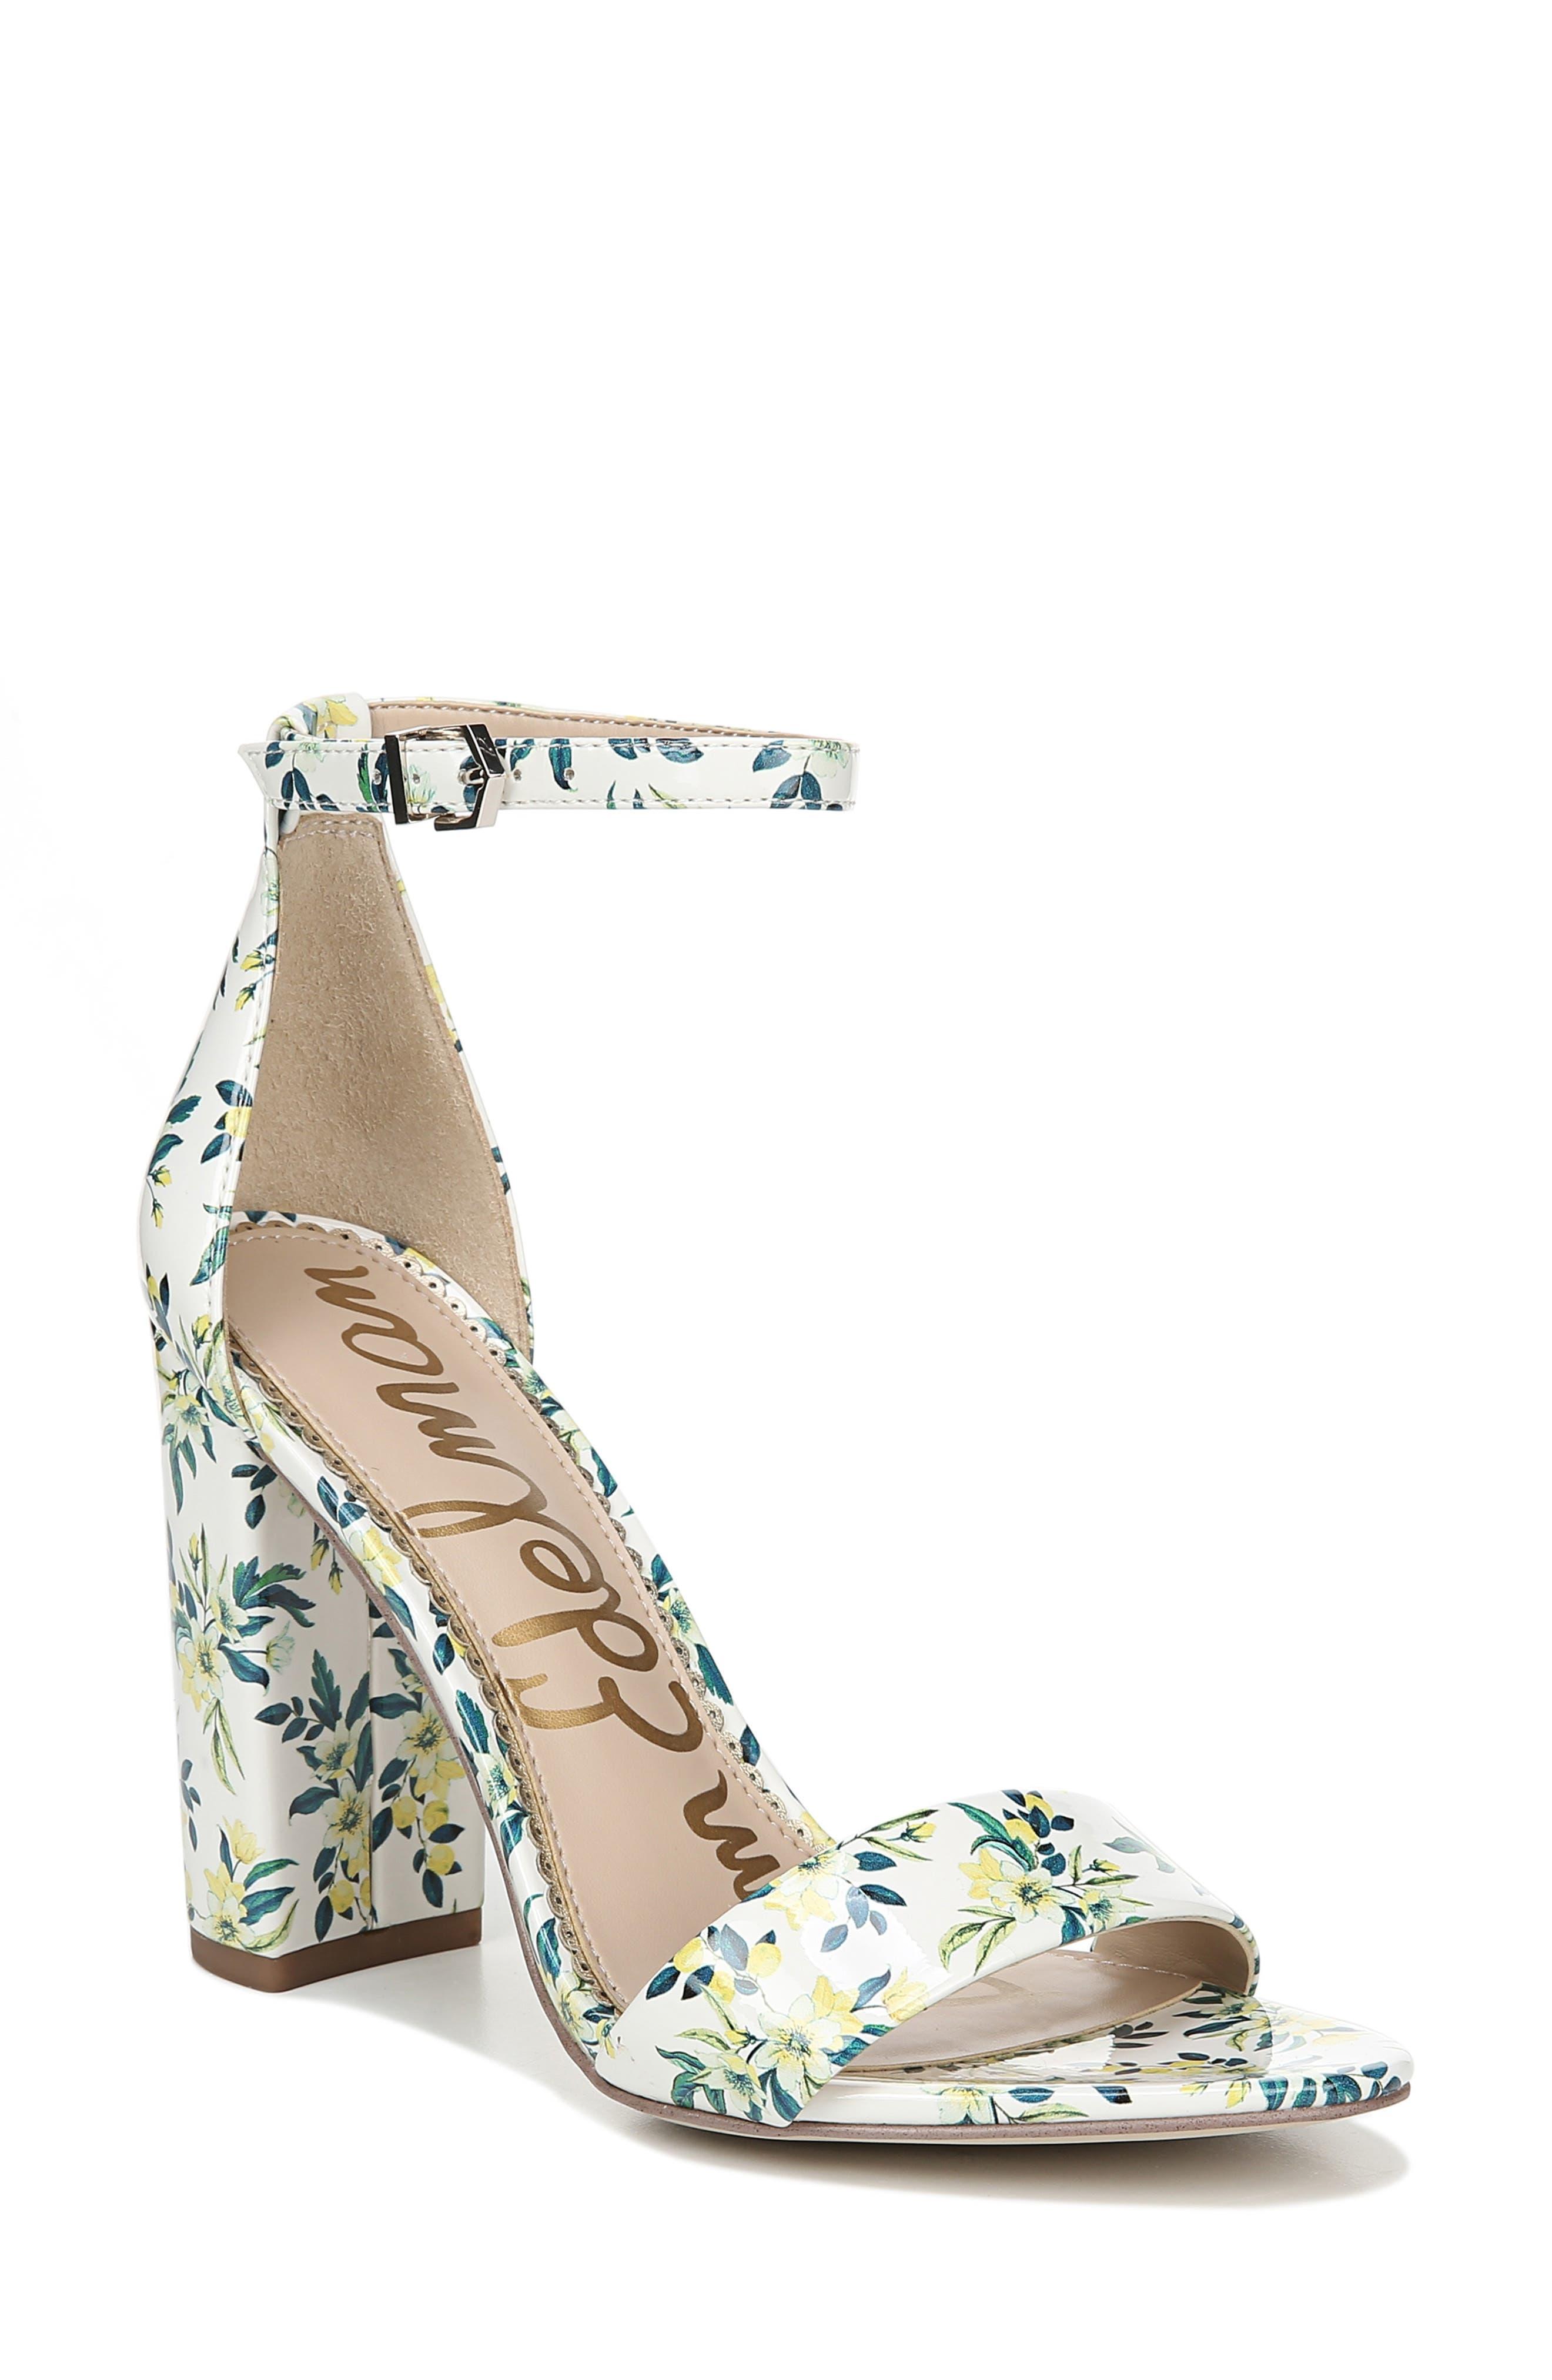 Yaro Ankle Strap Sandal,                             Main thumbnail 1, color,                             WHITE MULTI FABRIC